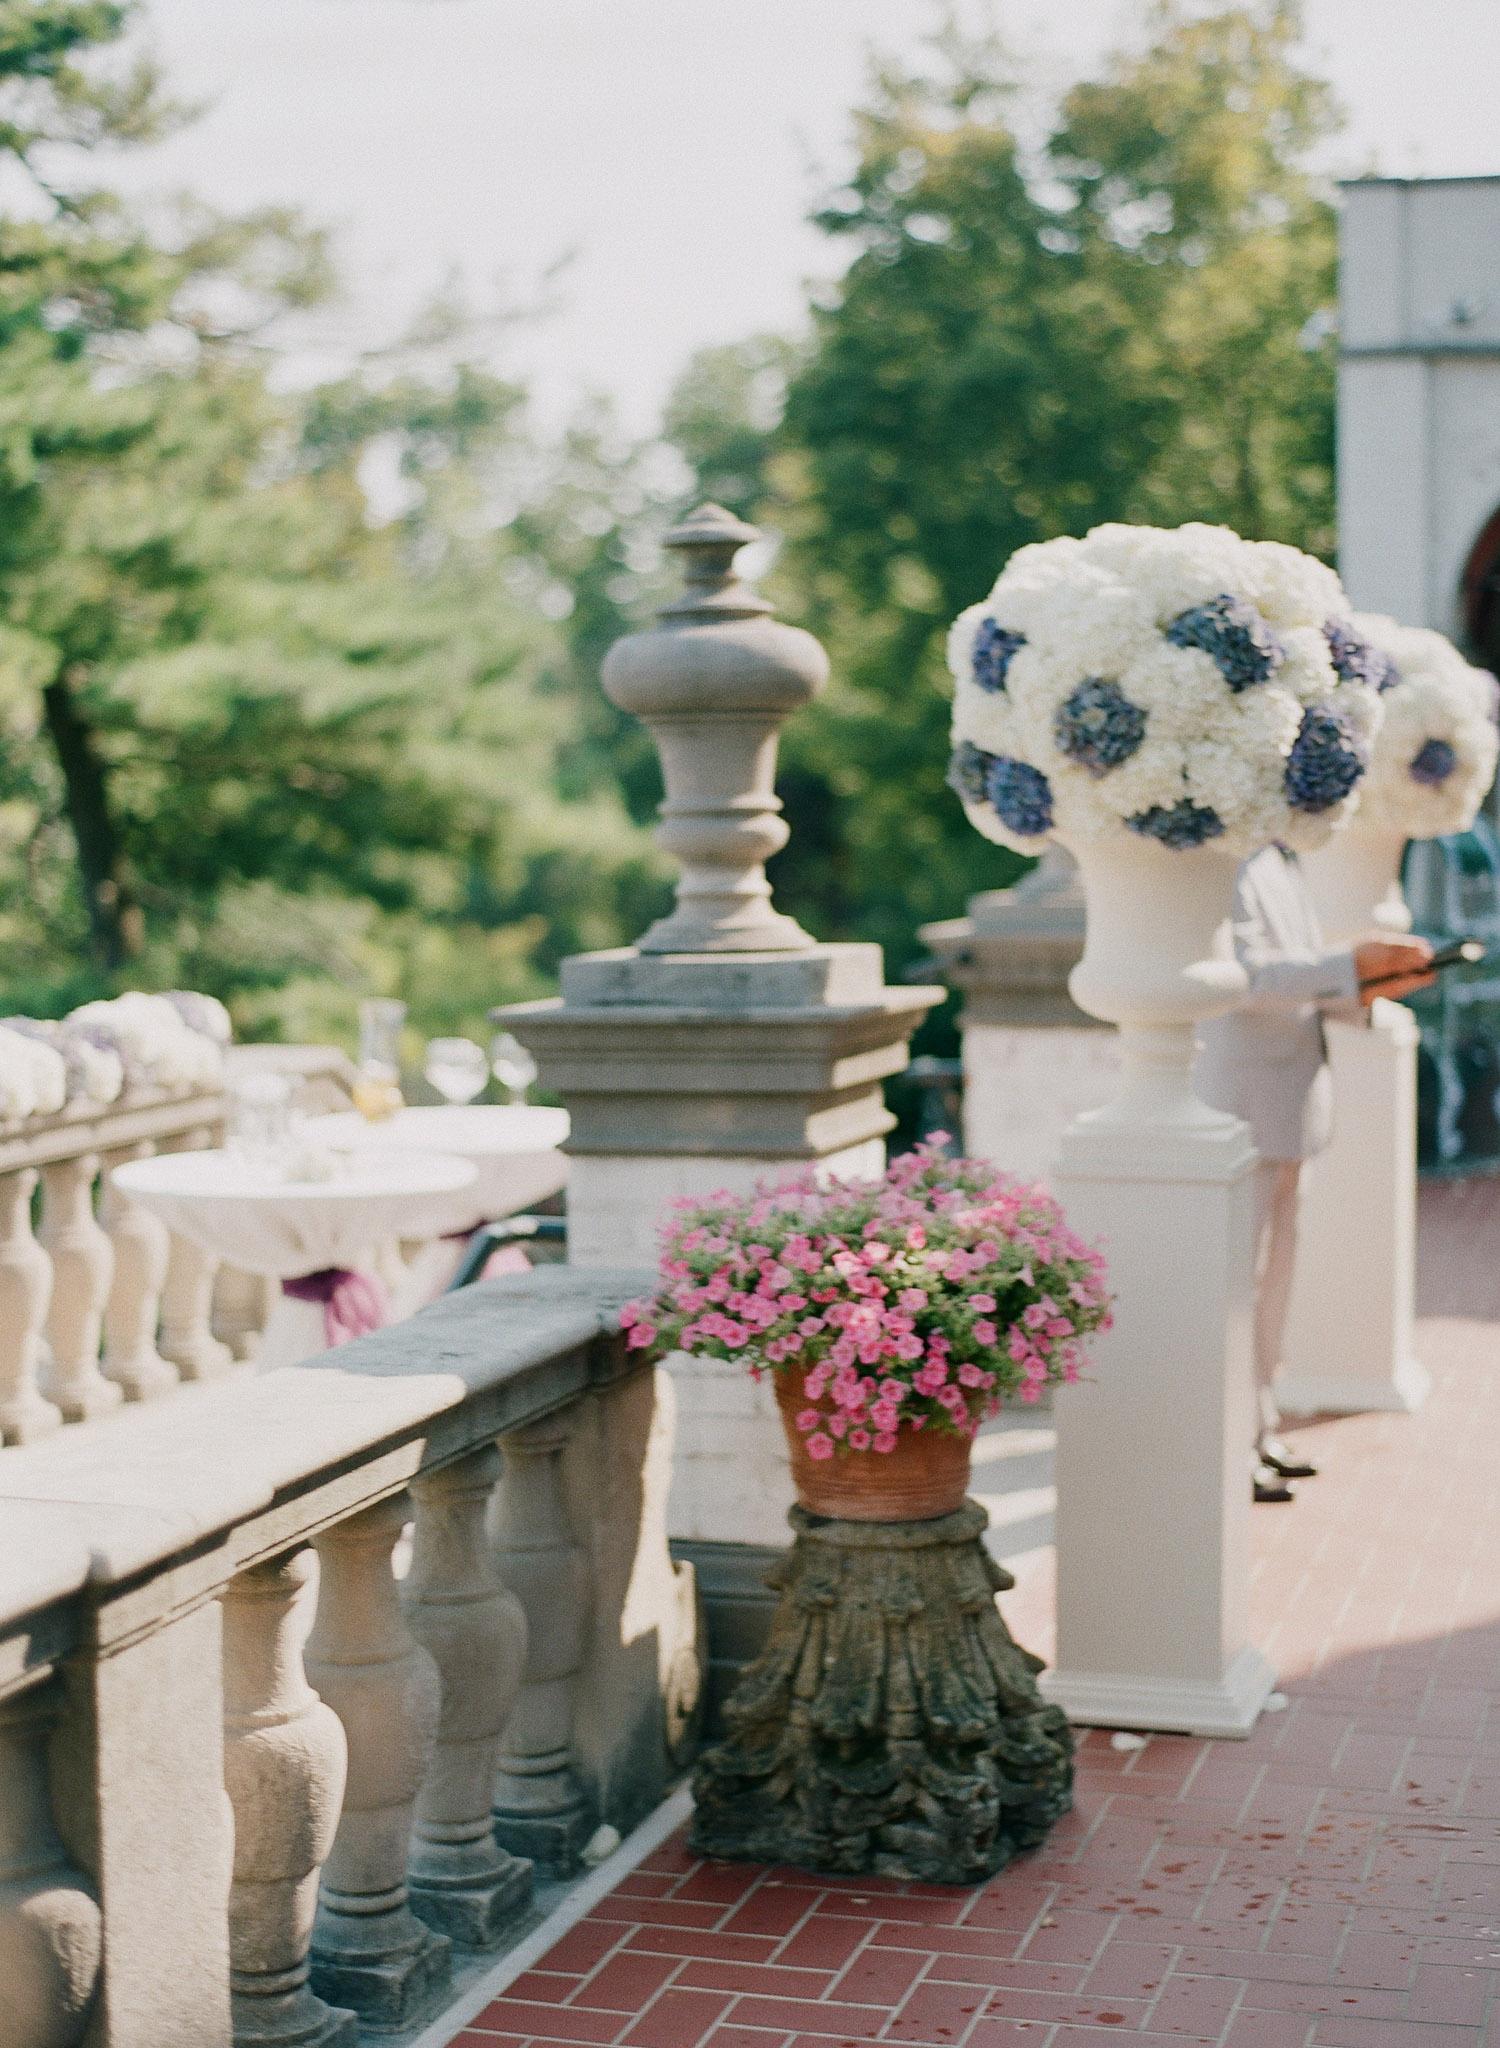 floral arrangements of vintage purple hydrangeas at the Italian Destination Wedding at the Villa Terrace - a favorite wedding venue of international wedding photographer, Lexia Frank, who is a film photographer for luxury weddings worldwide.